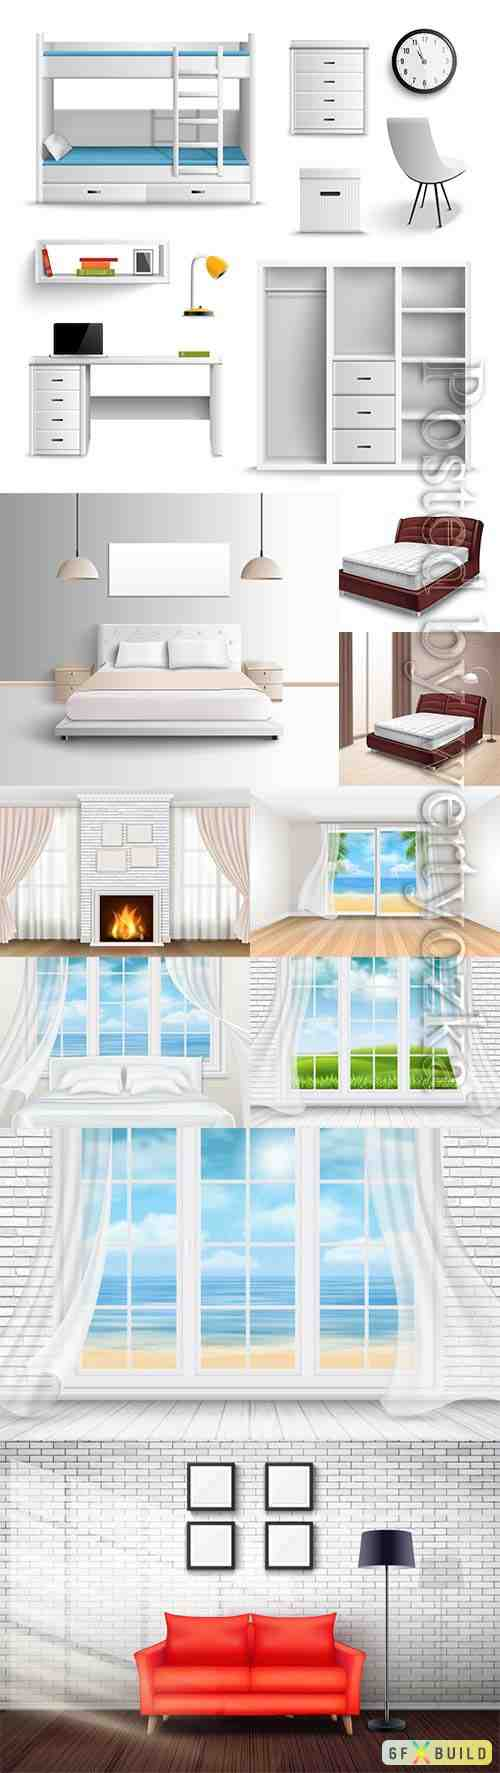 Interior of rooms, windows vector illustration